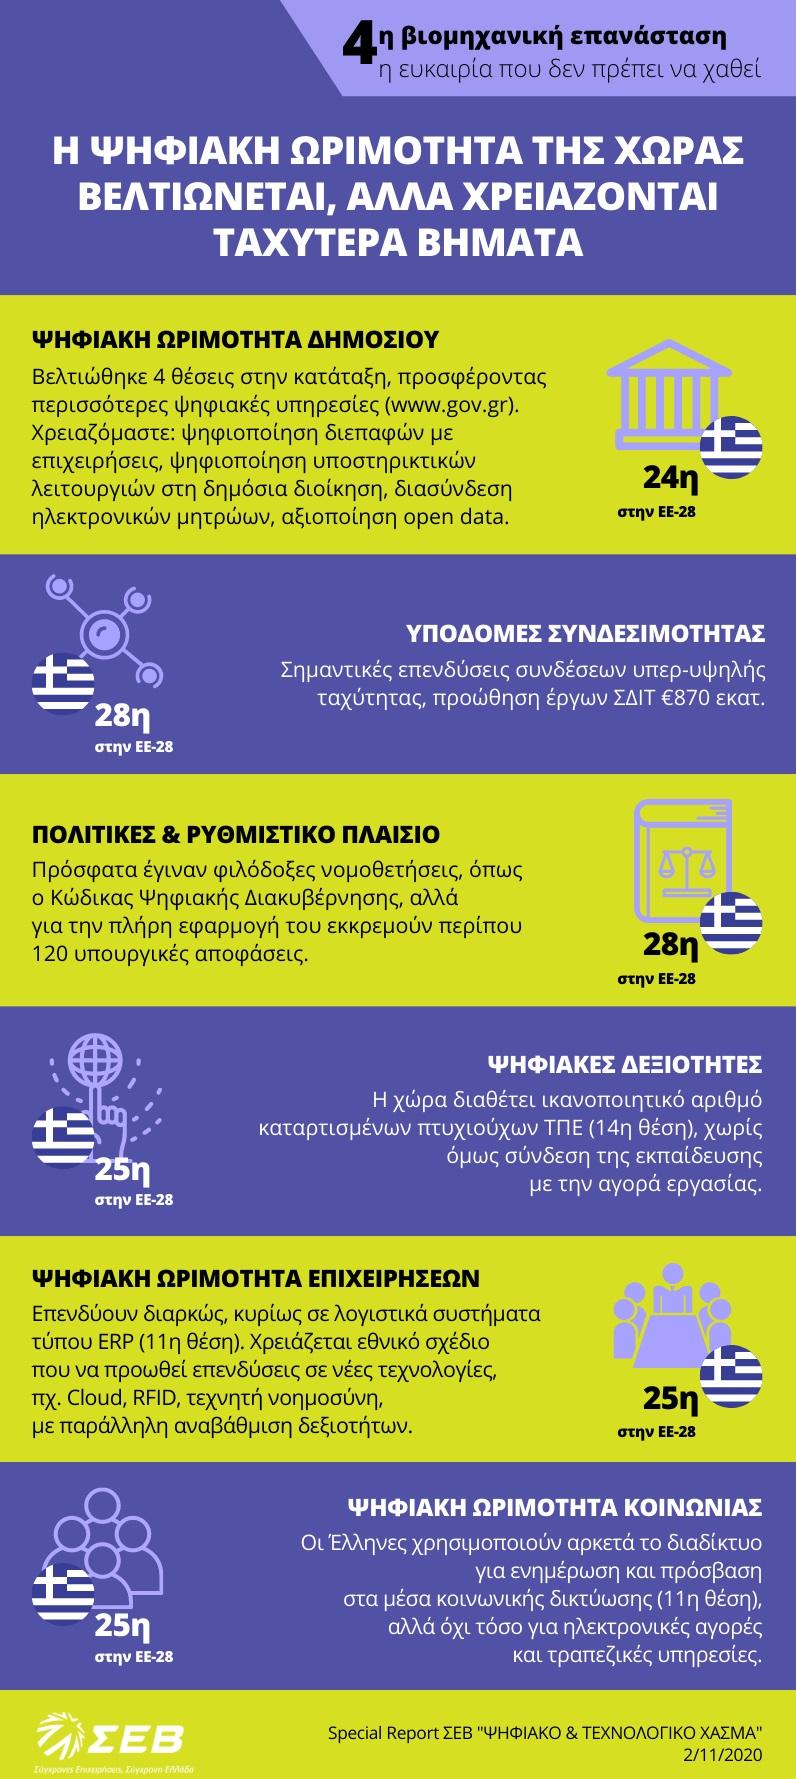 2020-11-02_PsifiakoXasma2020_2